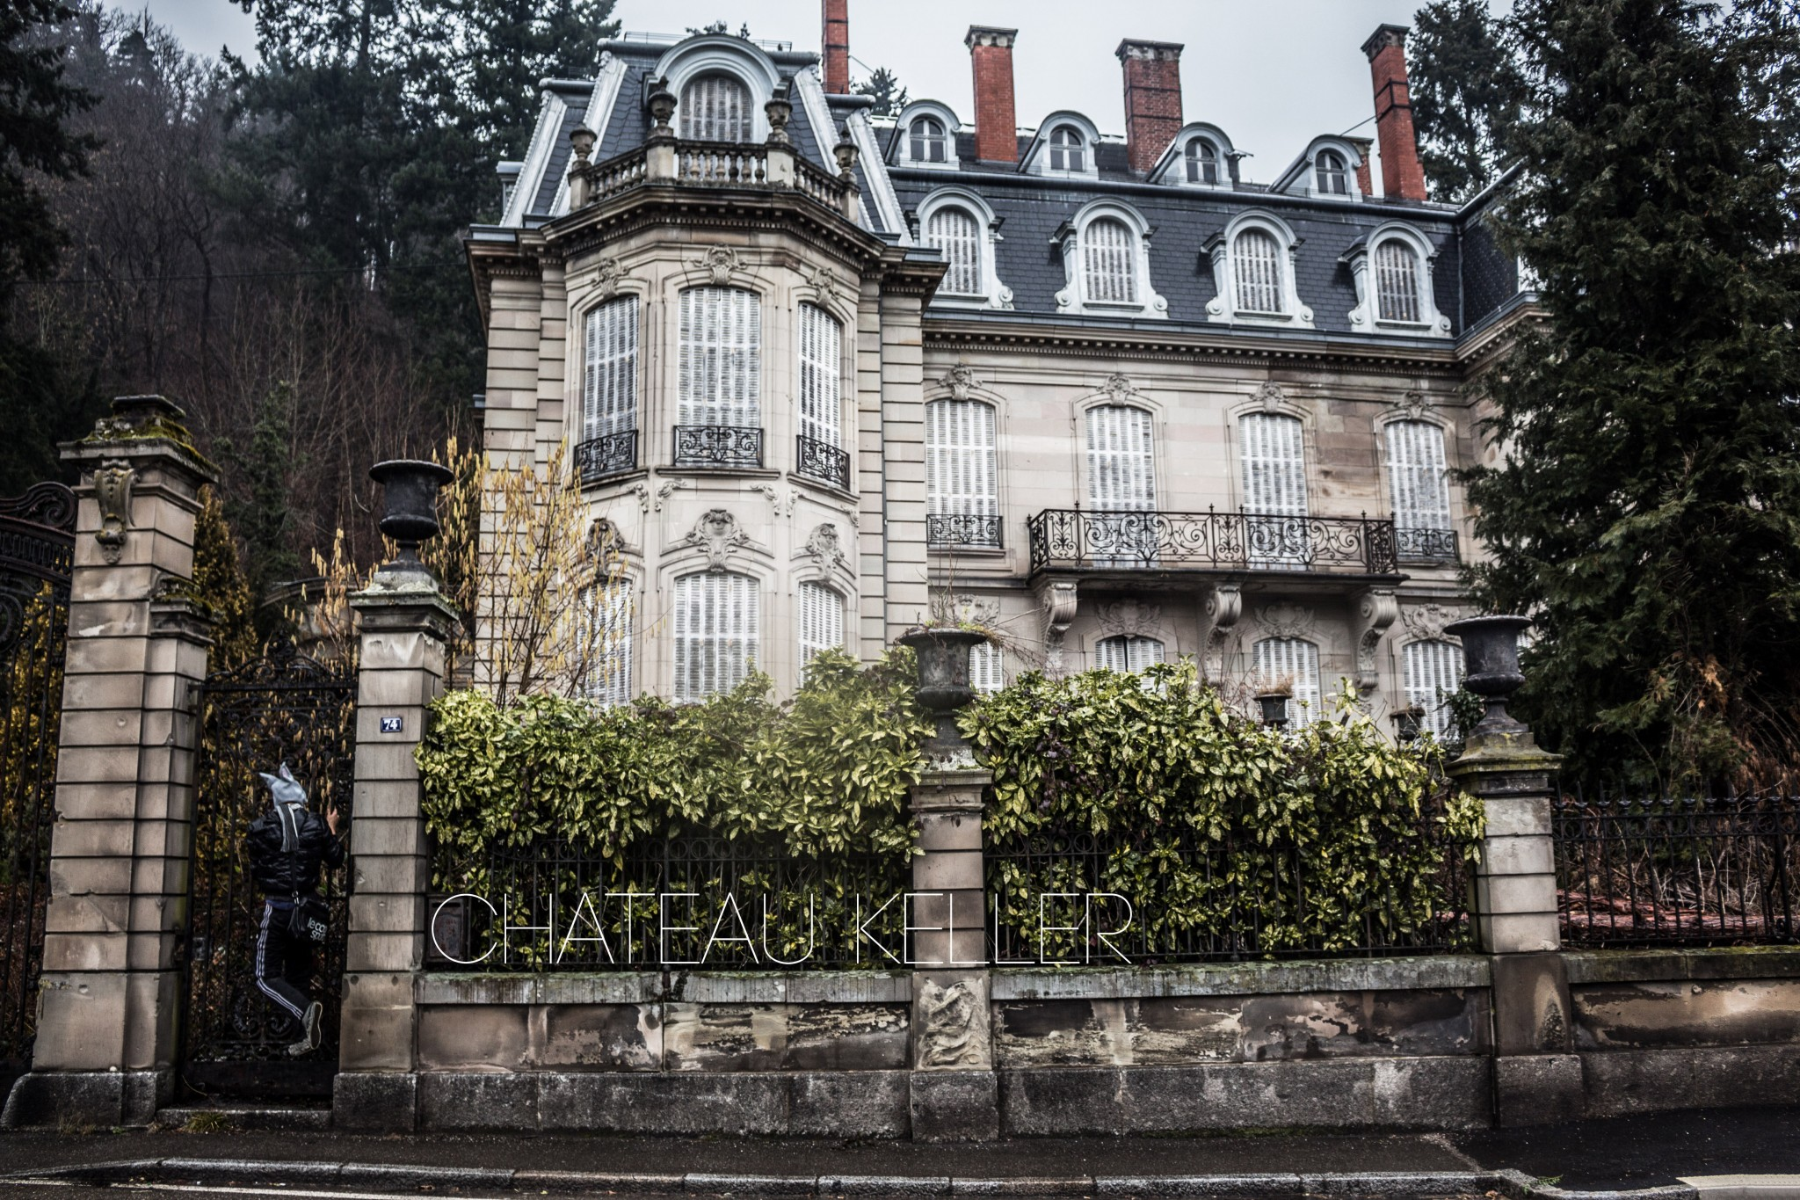 Restaurant Chateaux Lorraine